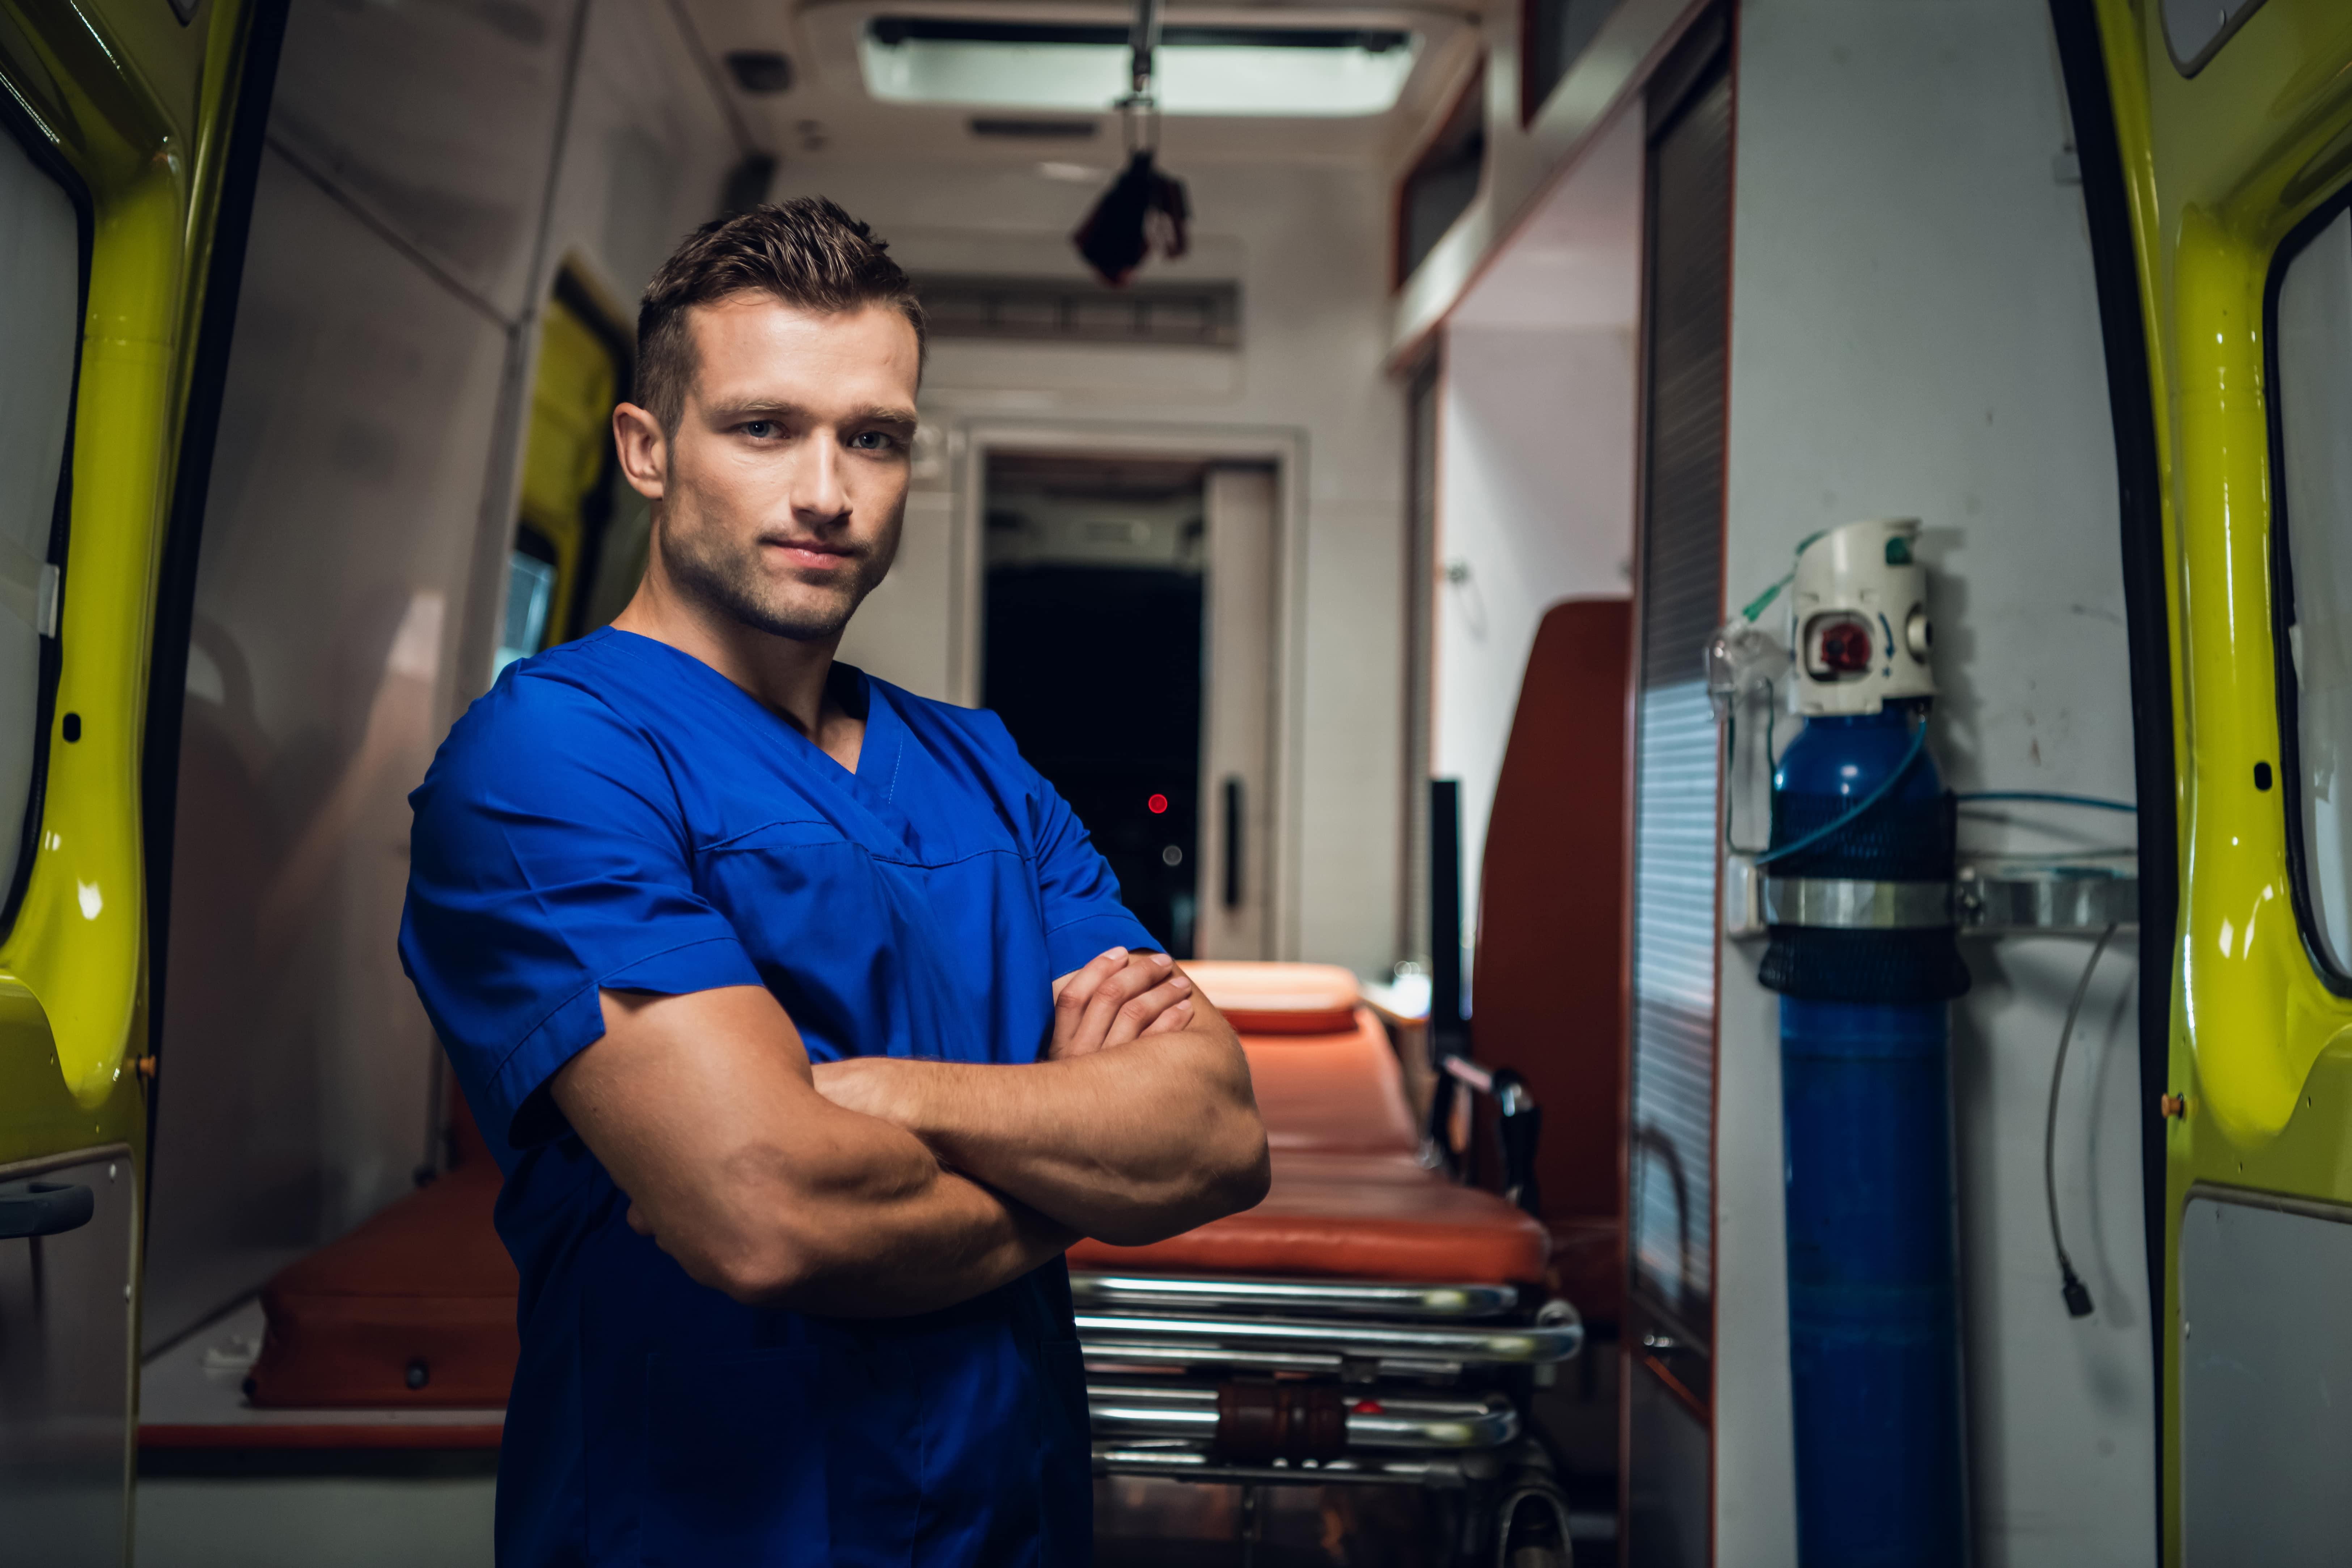 young-paramedic-looking-camera-smiling-ambulance-car-background-min